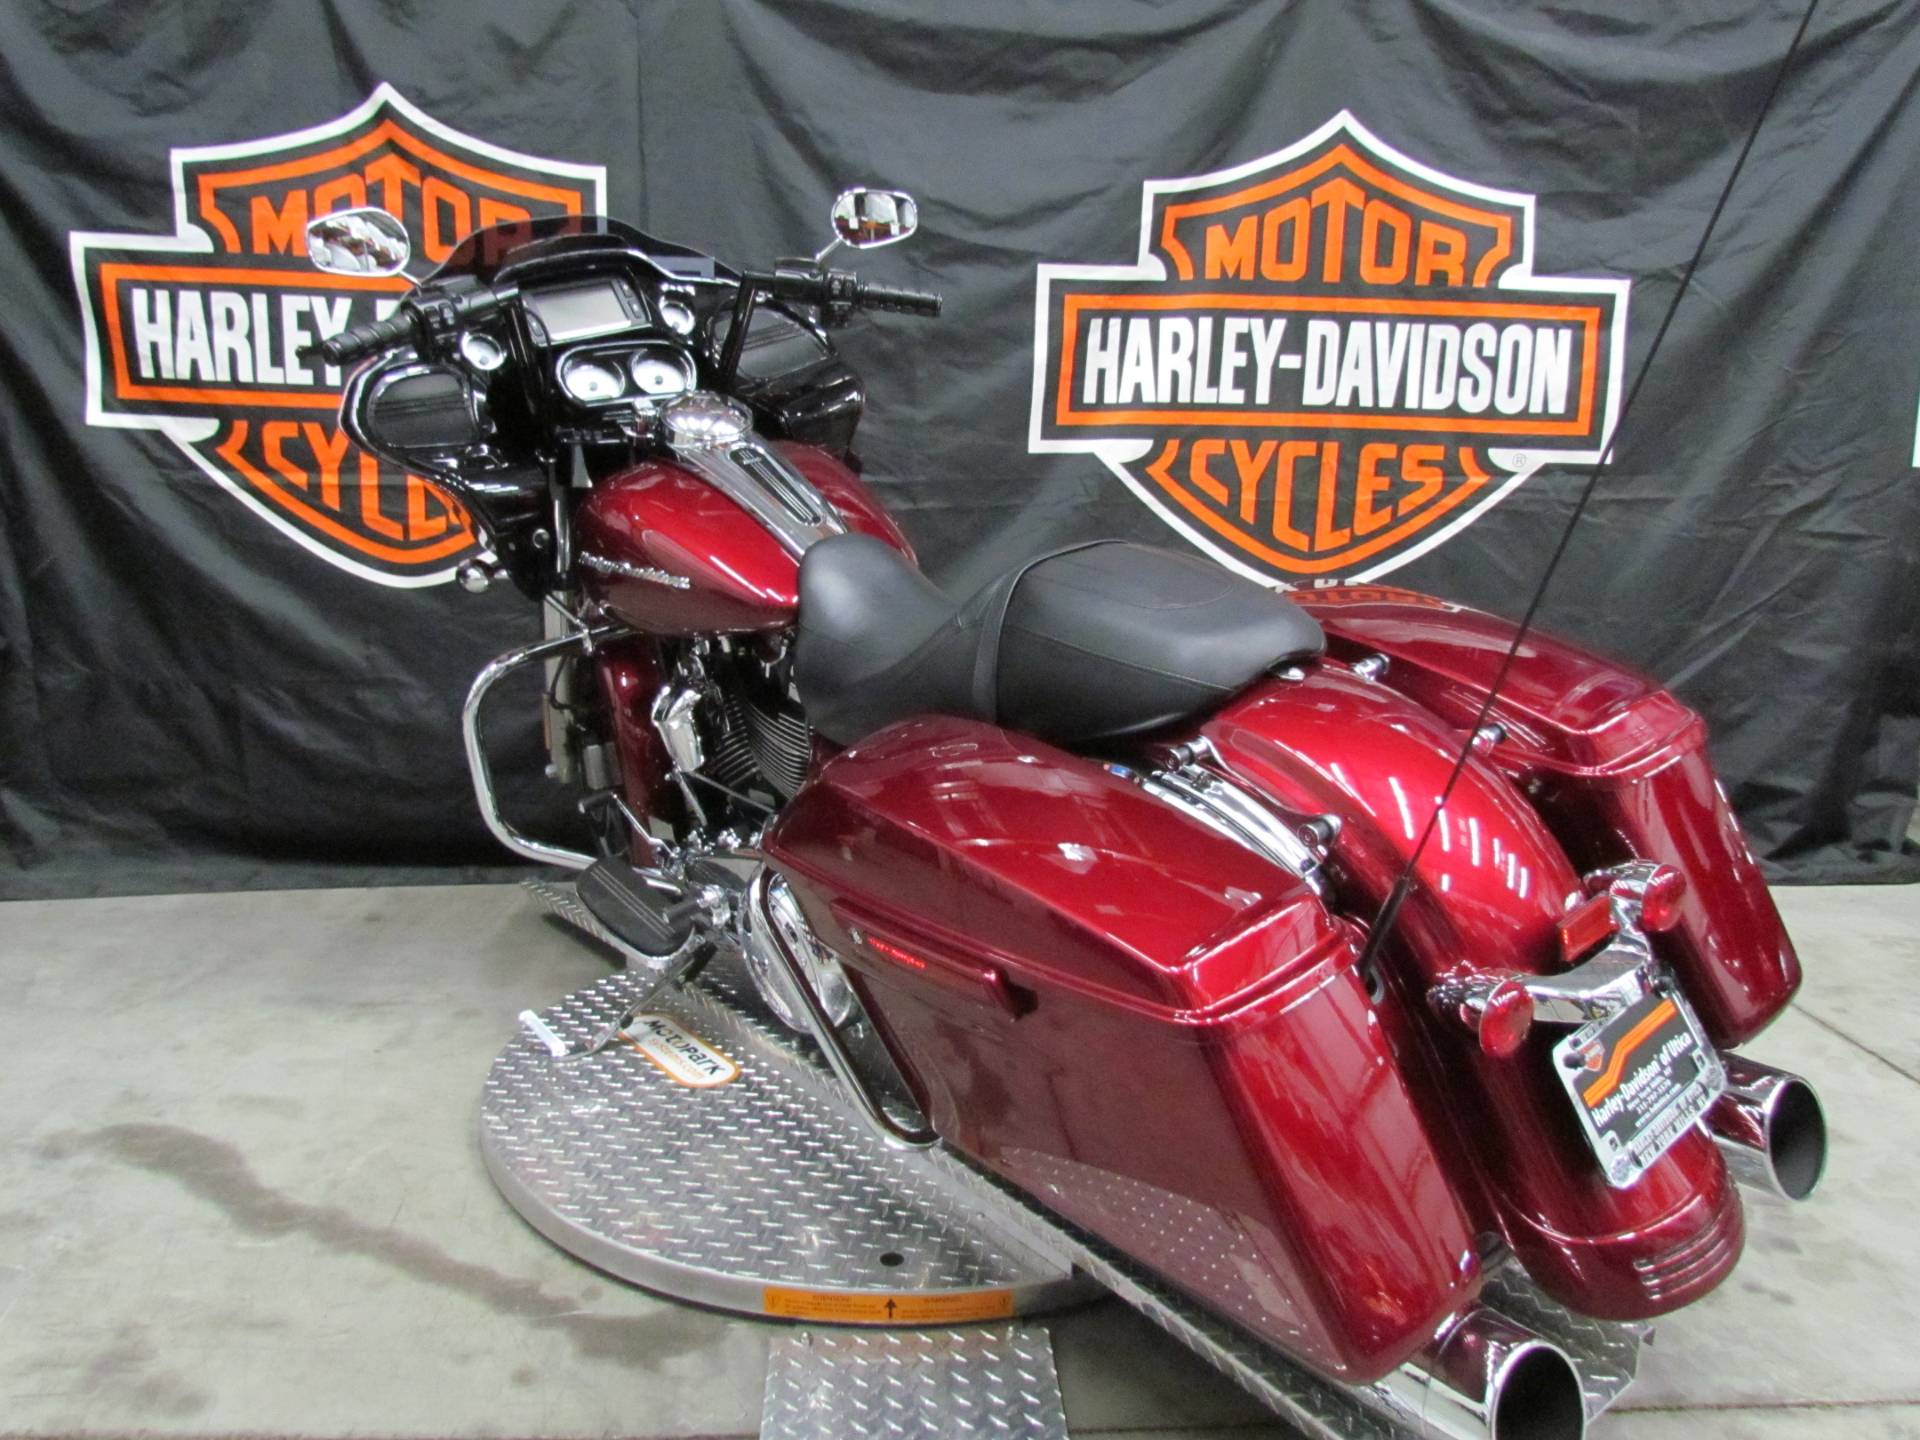 2017 Harley-Davidson Road Glide® Special in New York Mills, New York